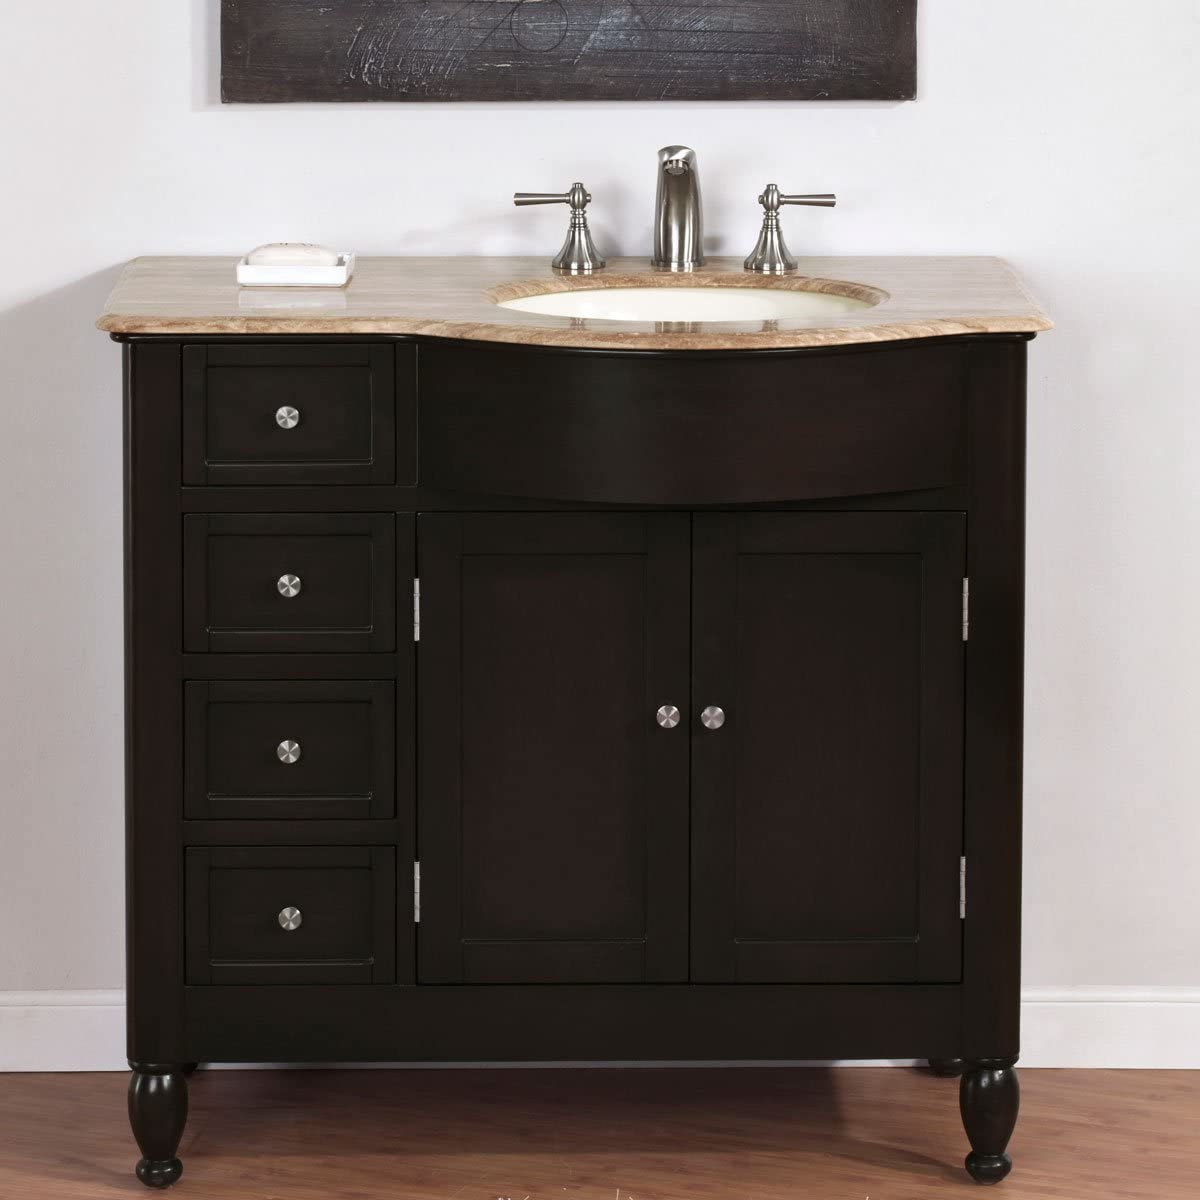 Silkroad Exclusive HYP-0902-T-UIC-38-R Single Right Sink Bathroom Vanity with Bath Furniture Cabinet, 38 , Dark Wood